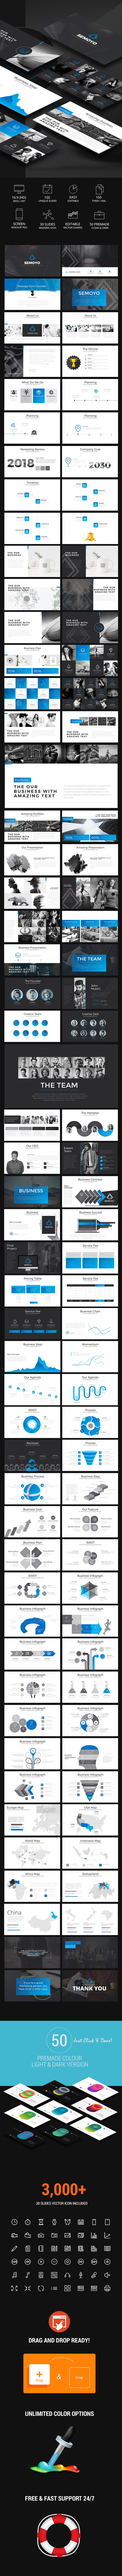 Semoyo PowerPoint - PowerPoint Templates Presentation Templates